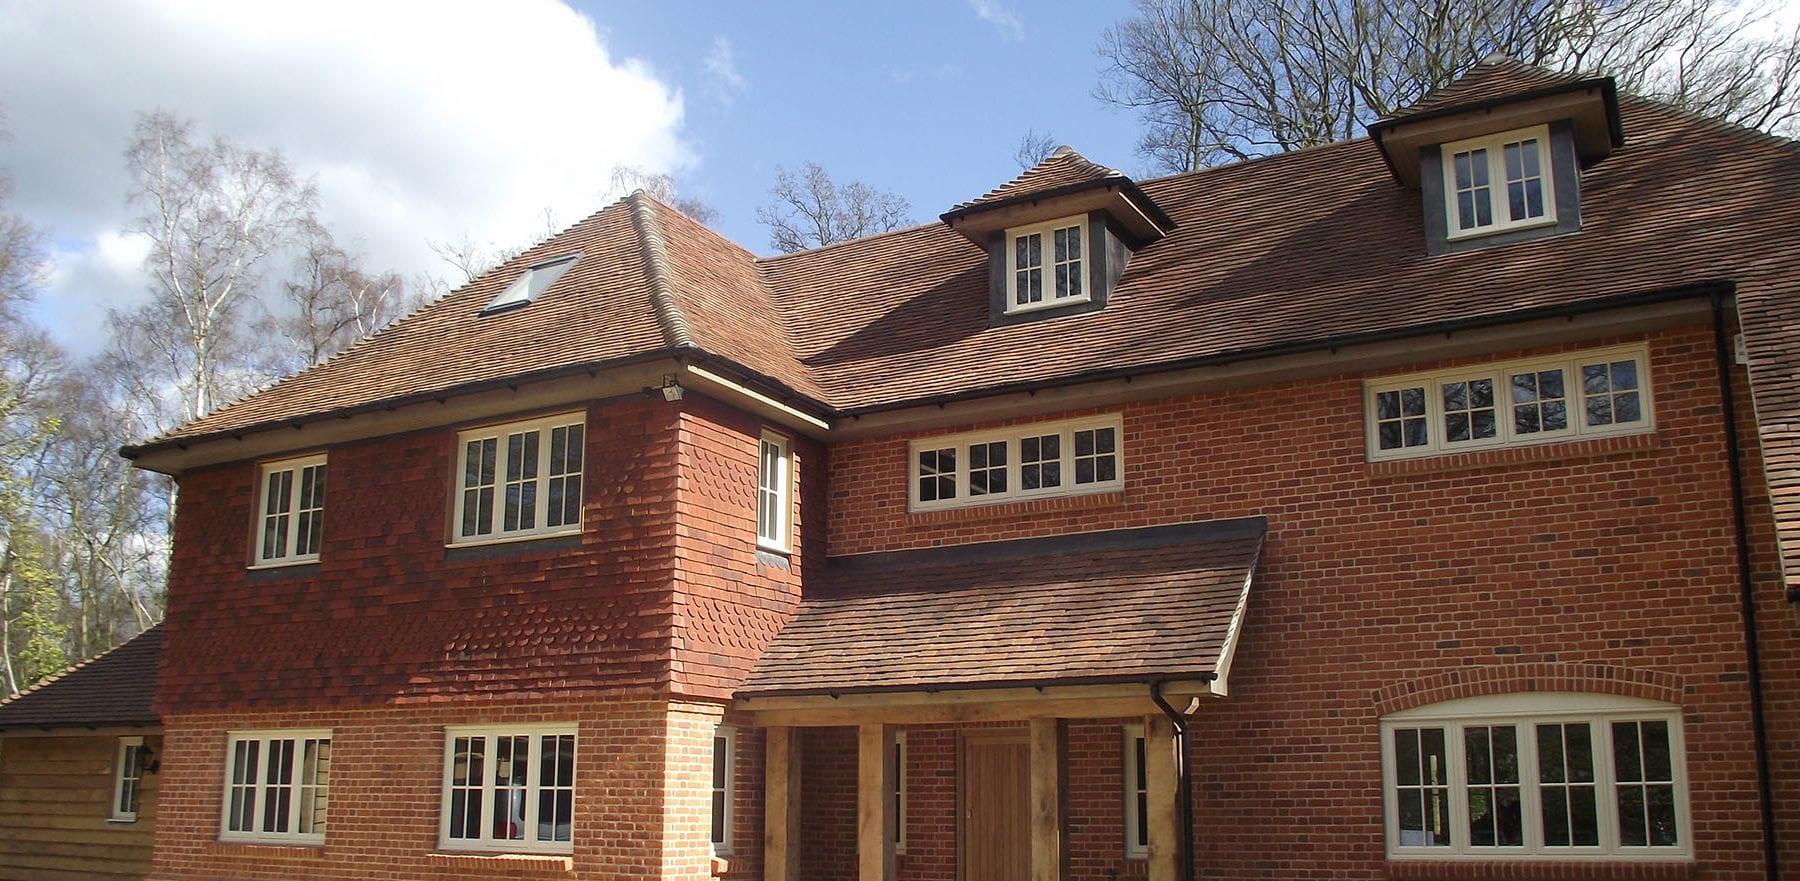 Lifestiles - Handmade Brown Clay Roof Tiles - Romsey, England 5